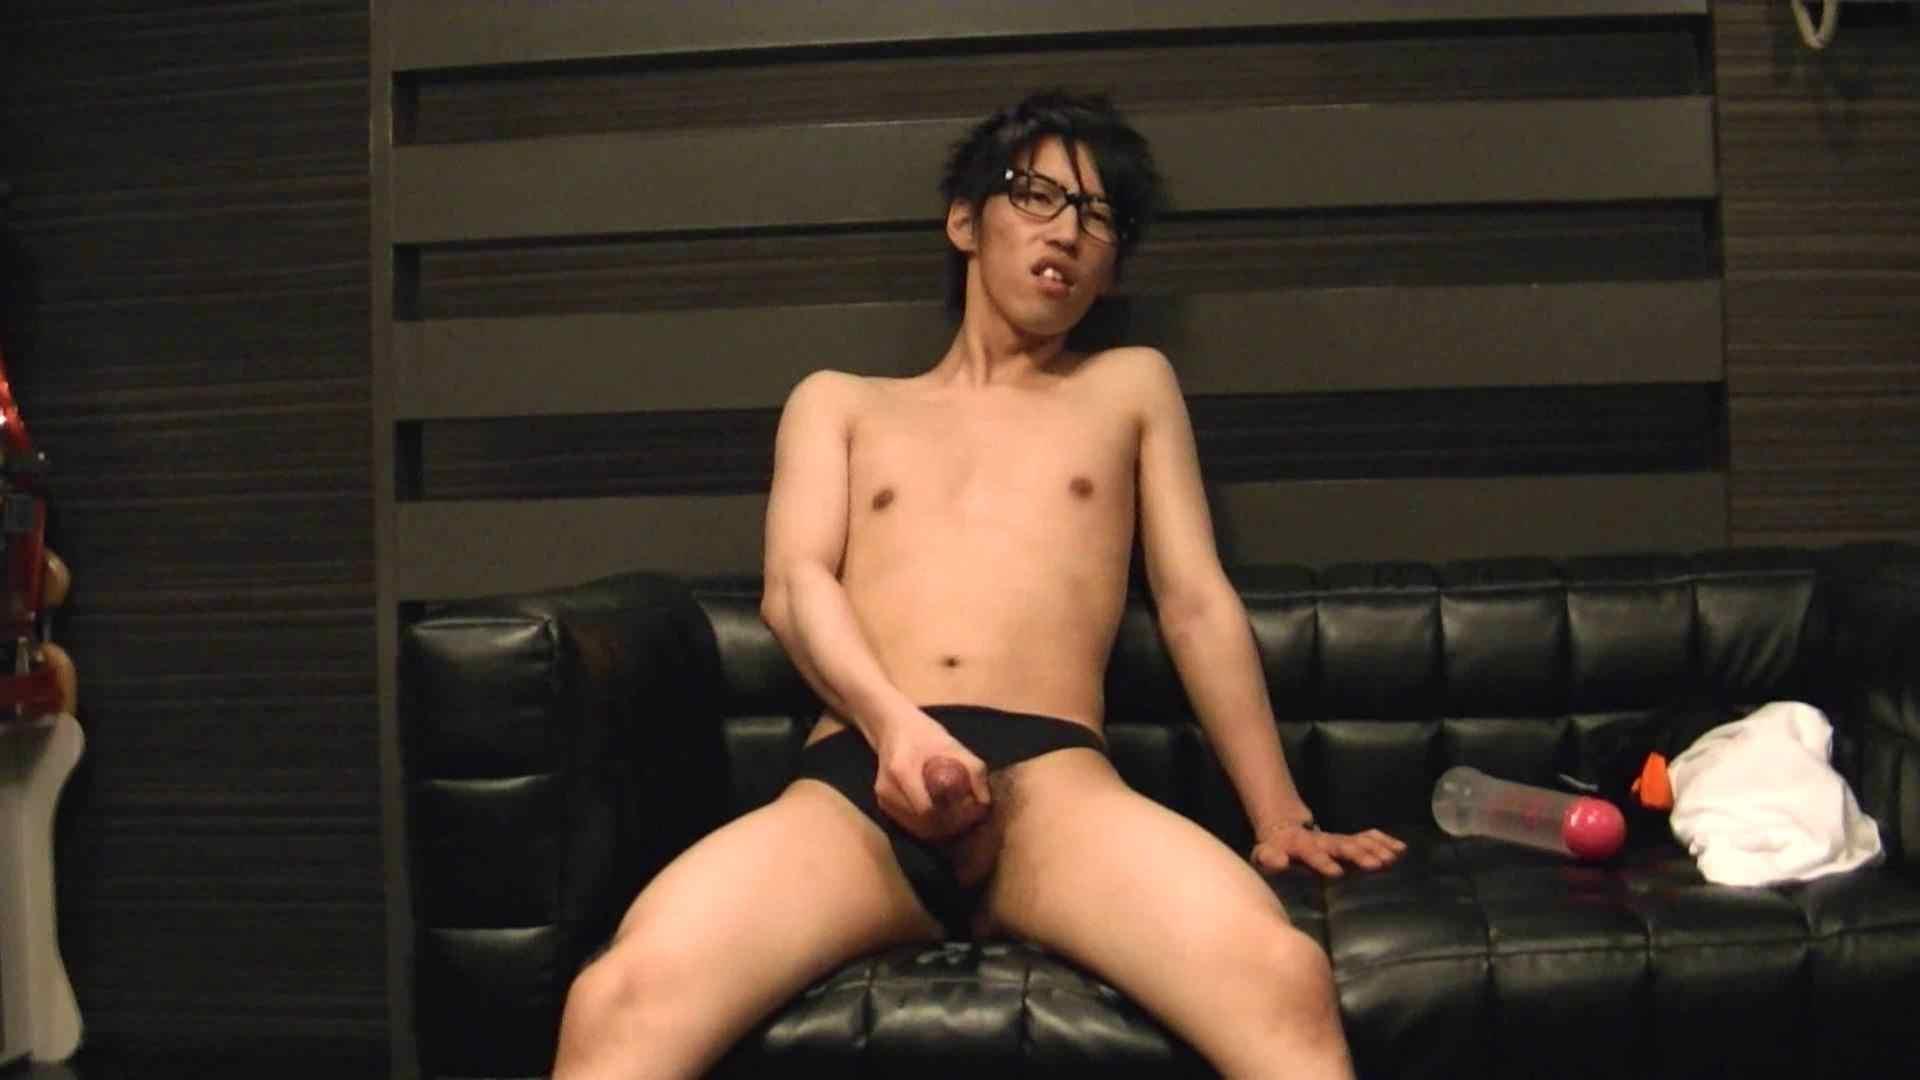 ONA見せカーニバル!! Vol3 男 ゲイ無料無修正画像 89枚 20